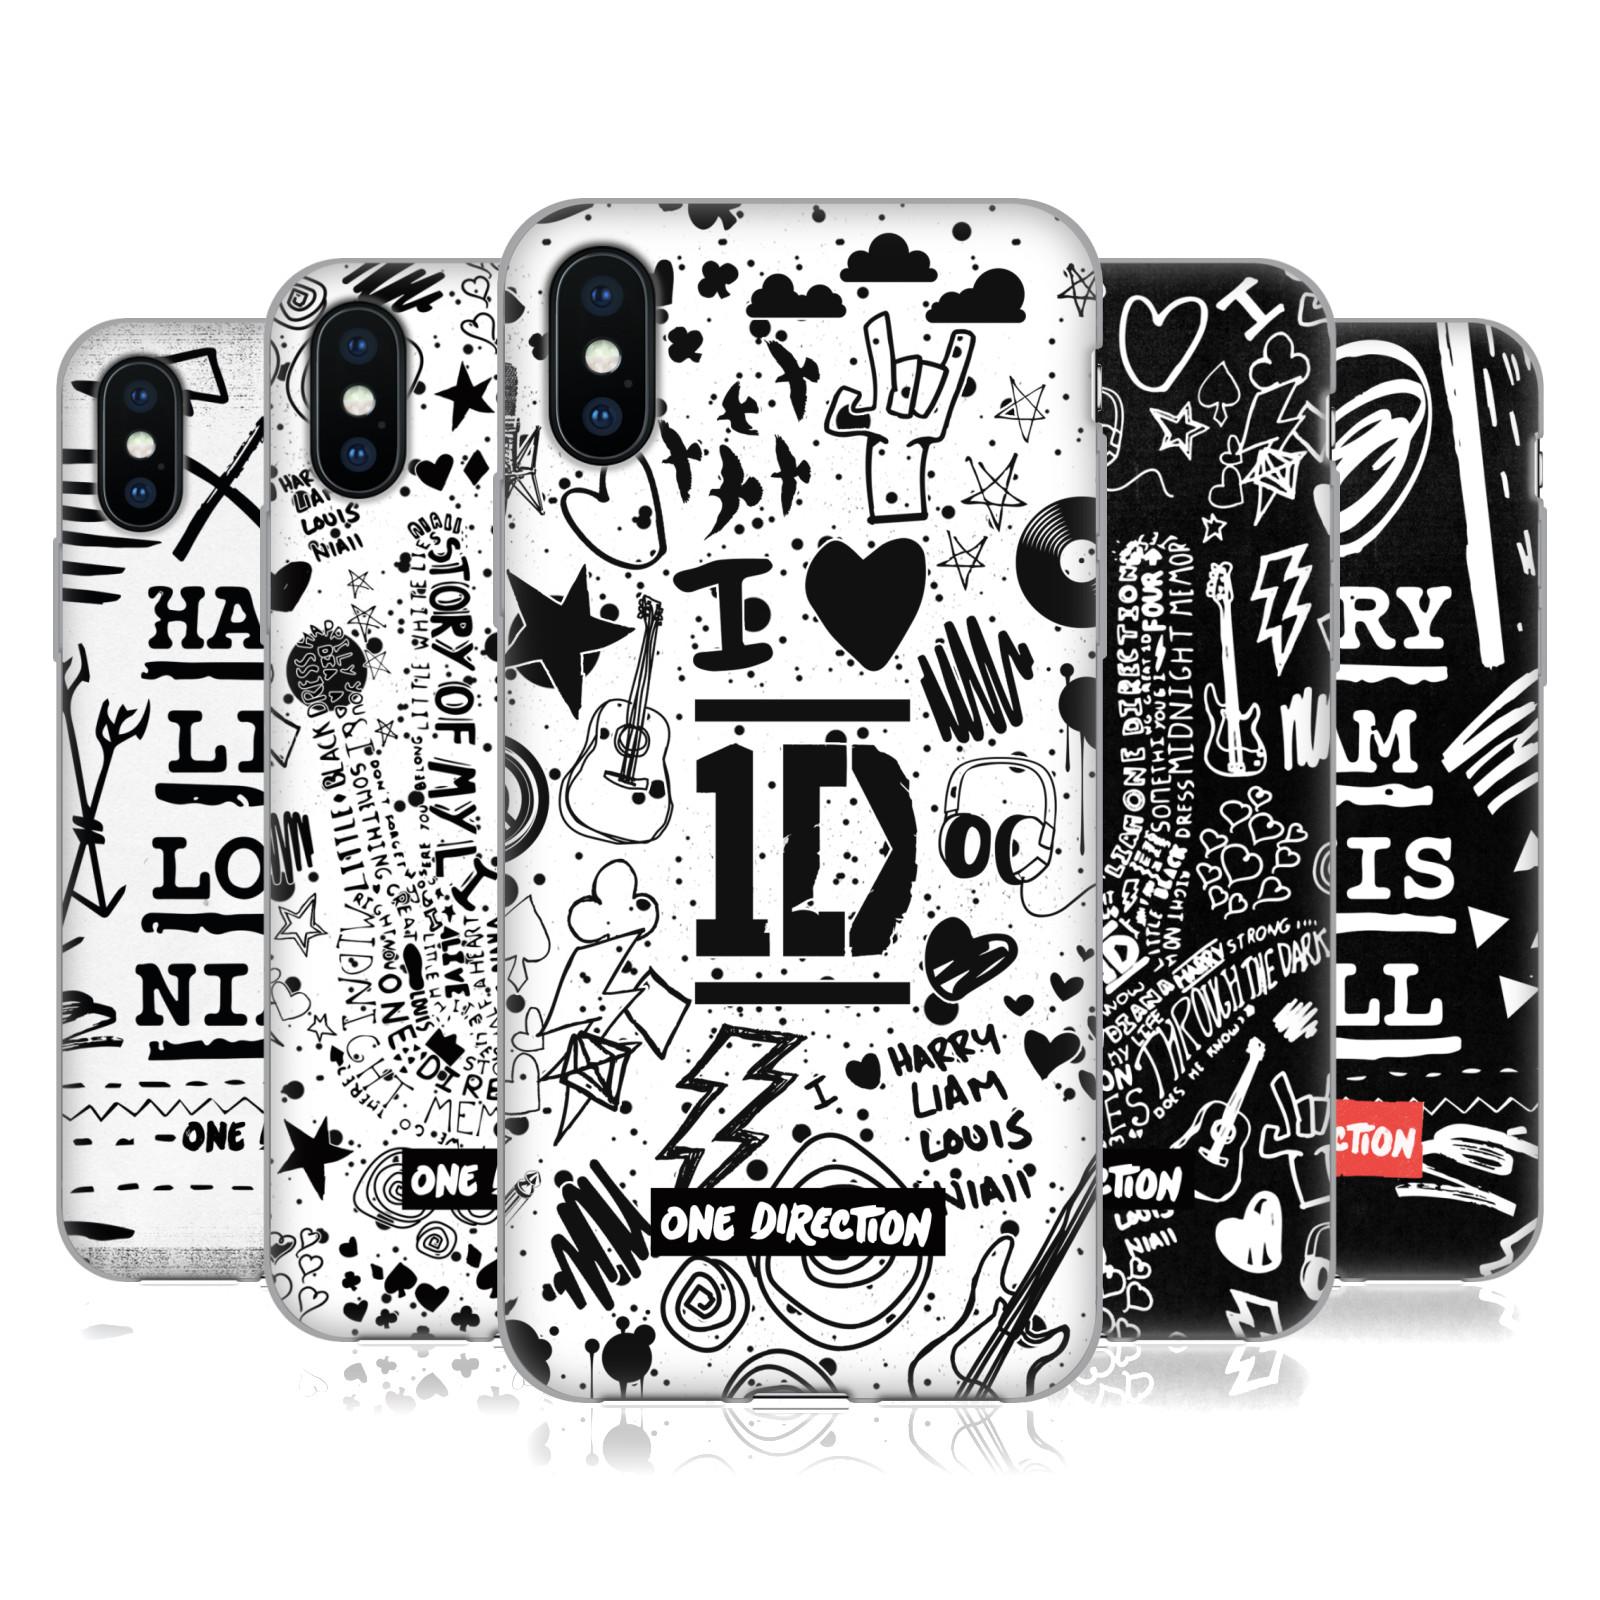 One Direction Doodle Design